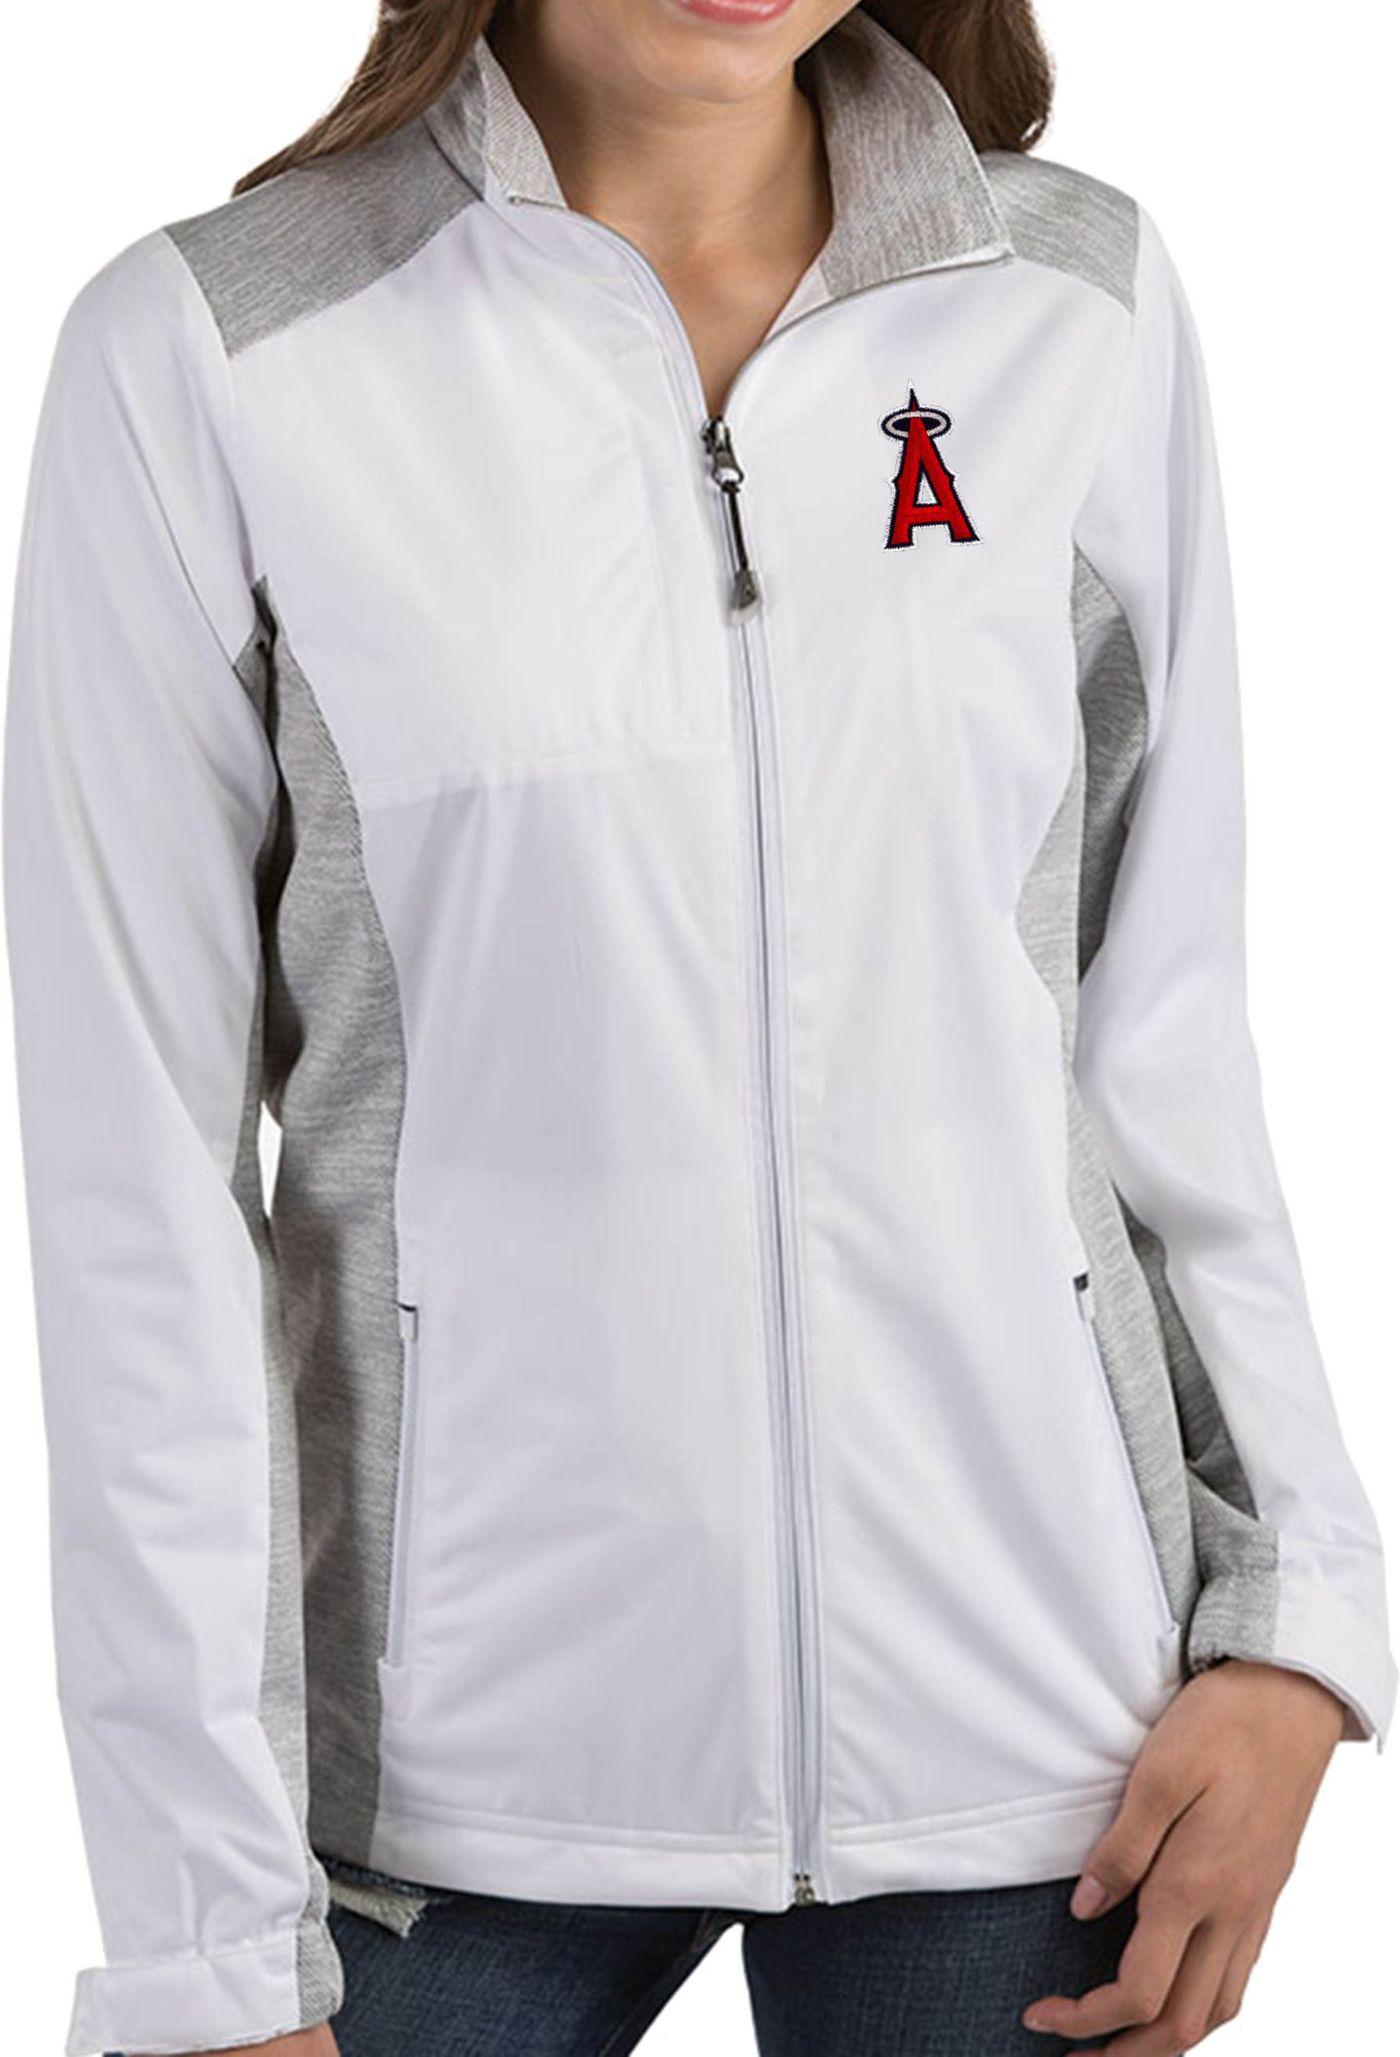 Antigua Women's Los Angeles Angels Revolve White Full-Zip Jacket